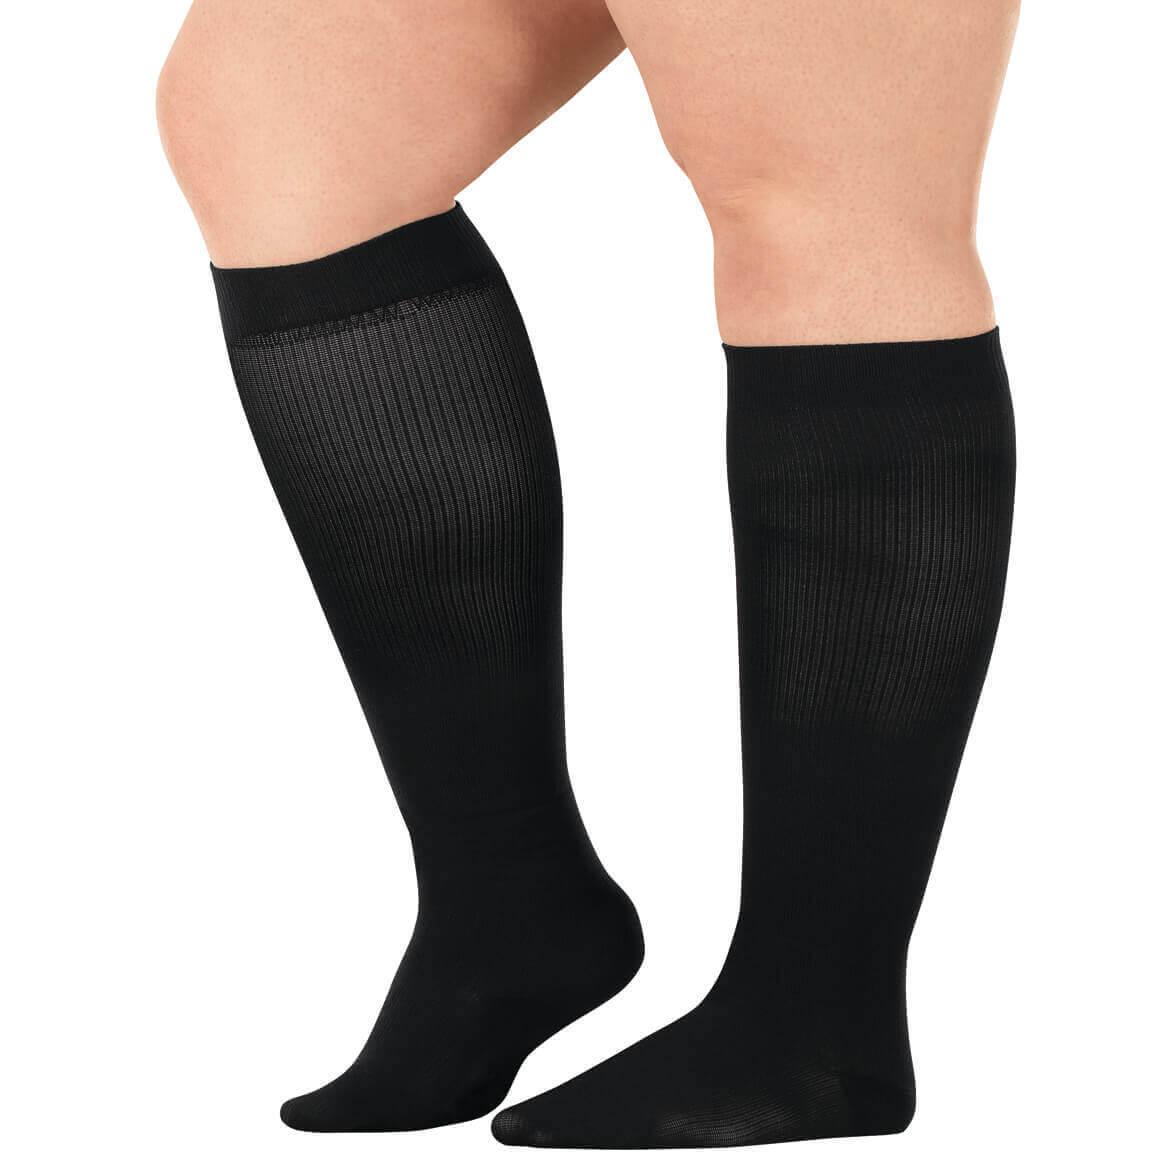 Healthy Steps™ Wide Calf Compression Socks 8-15 mmHg, 3 Pair